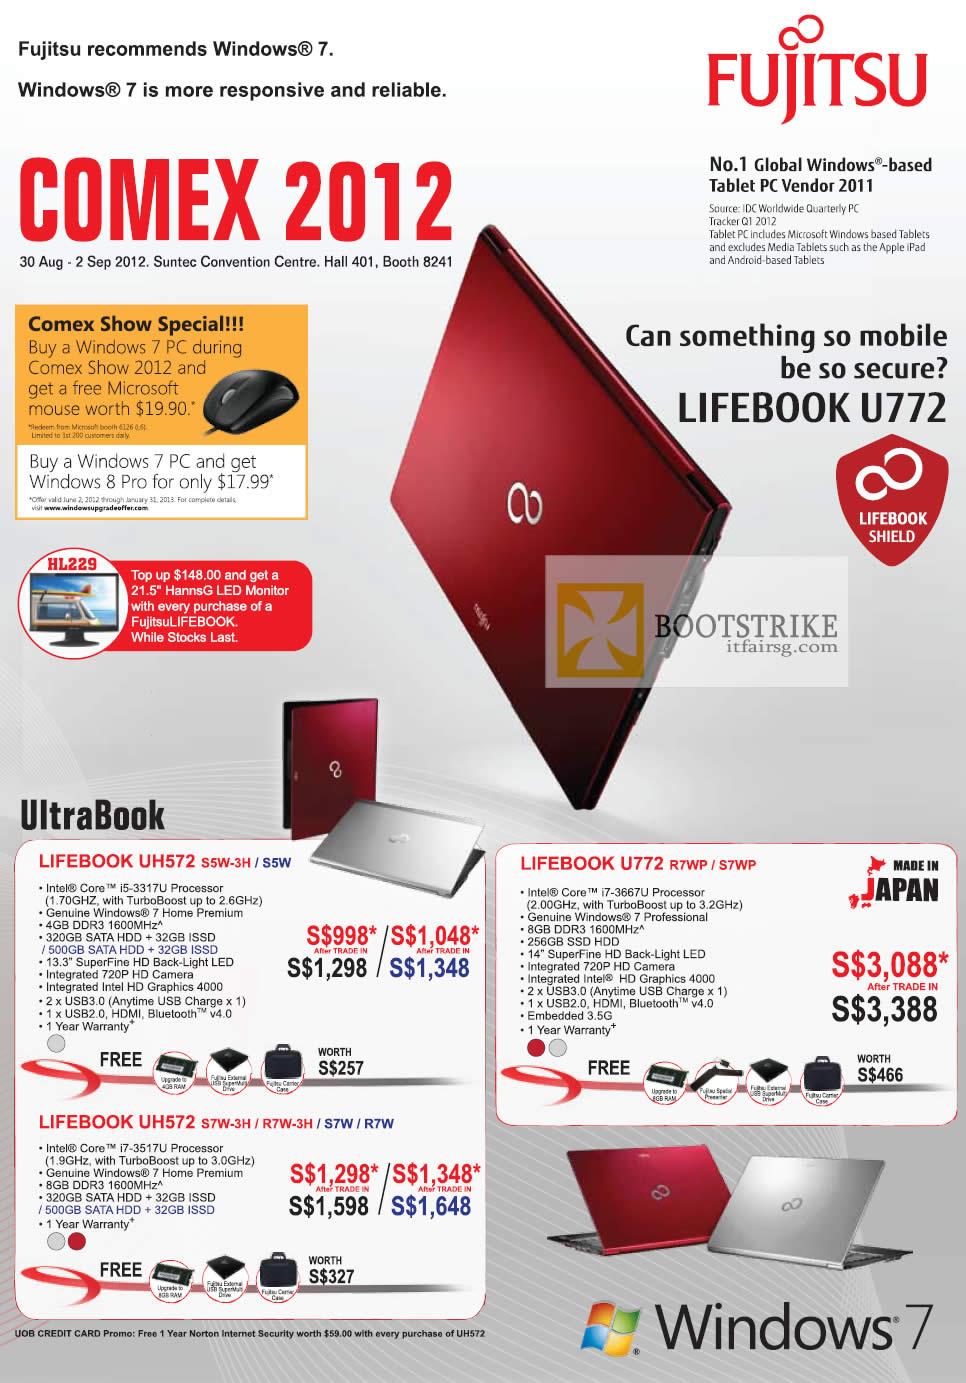 COMEX 2012 price list image brochure of Fujitsu Notebooks Lifebook UH572 S5W-3H S5W, U772 R7WP S7WP, UH572 S7W-3H R7W-3H S7W R7W